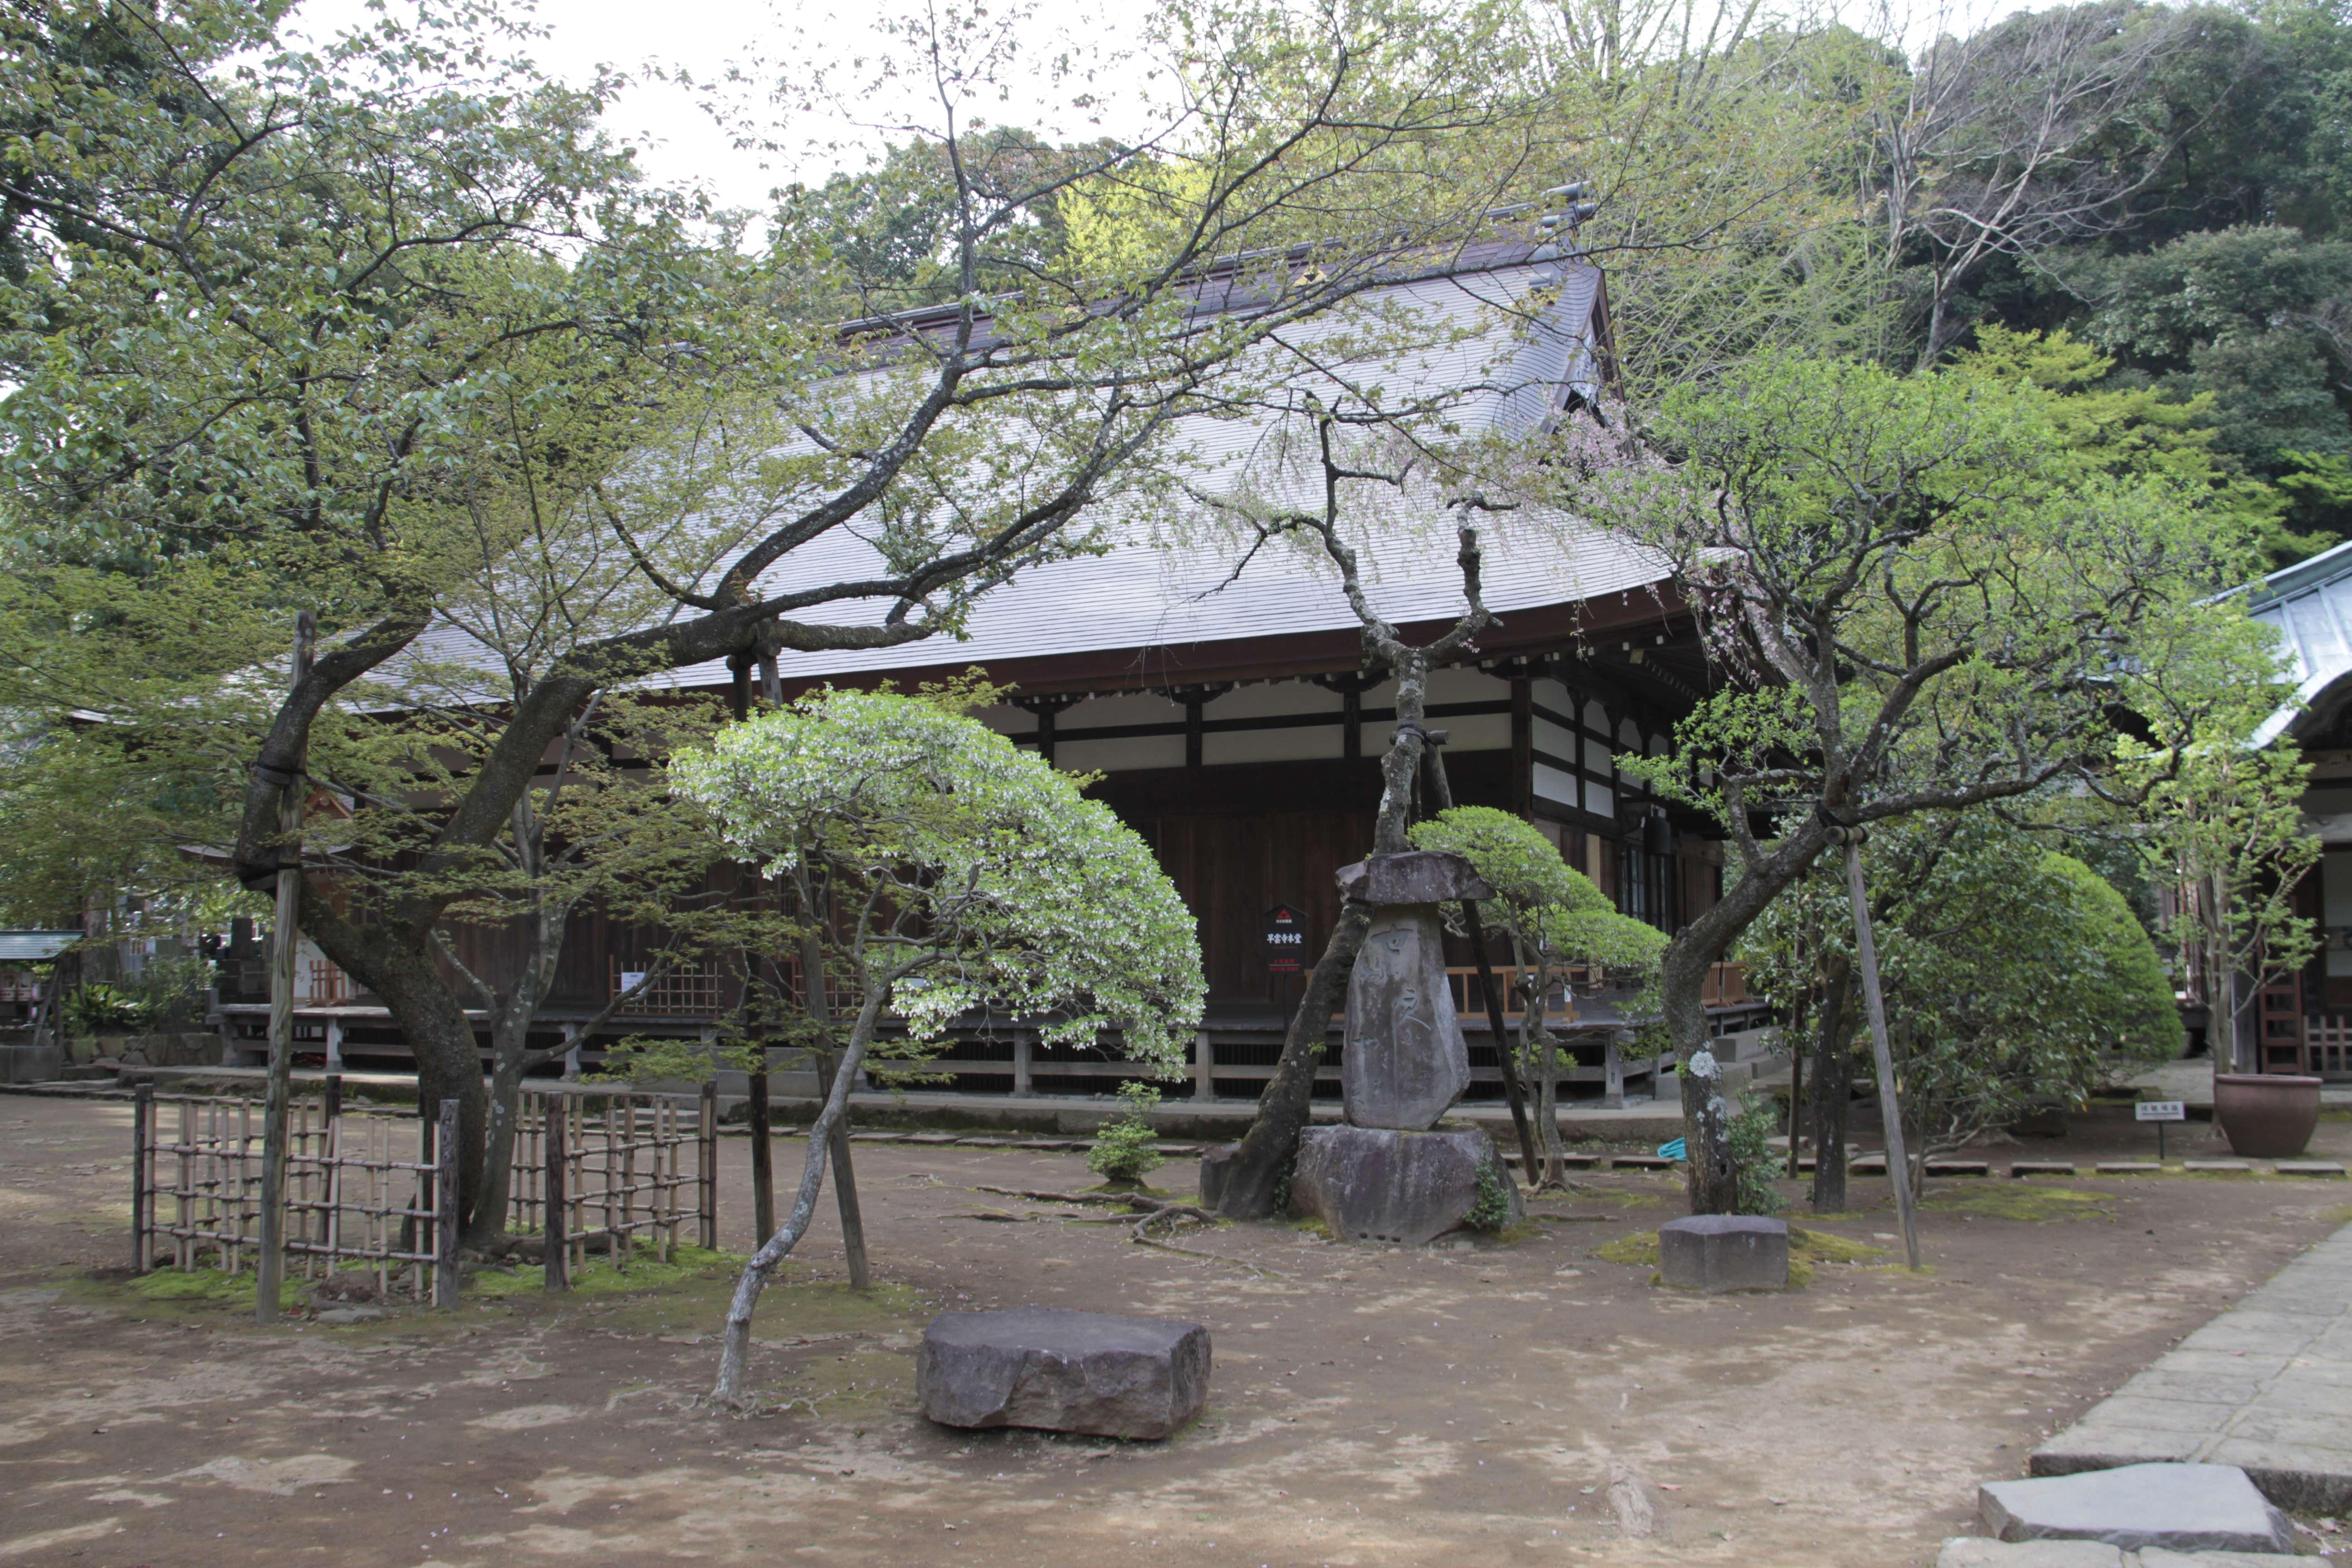 Japon avril 2017_0284 Hakone Yumoto sanctuaire bouddhiste Soun ji